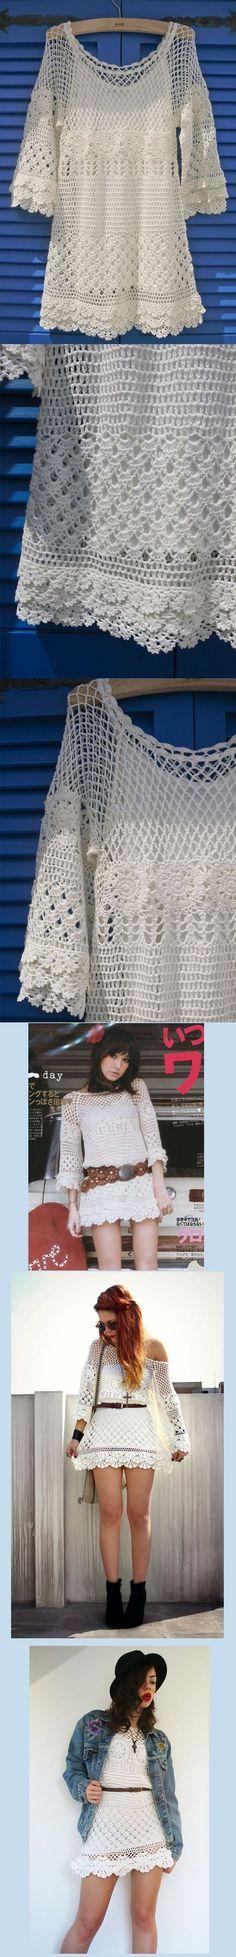 Crochet Dress … In the pattern … Hand Delicacy crochet dress mesh - Do it Yourself Clothes Crochet Lace Dress, Crochet Tunic, Irish Crochet, Crochet Clothes, Crochet Tops, Crochet Bikini, Mode Crochet, Crochet Woman, Beautiful Crochet